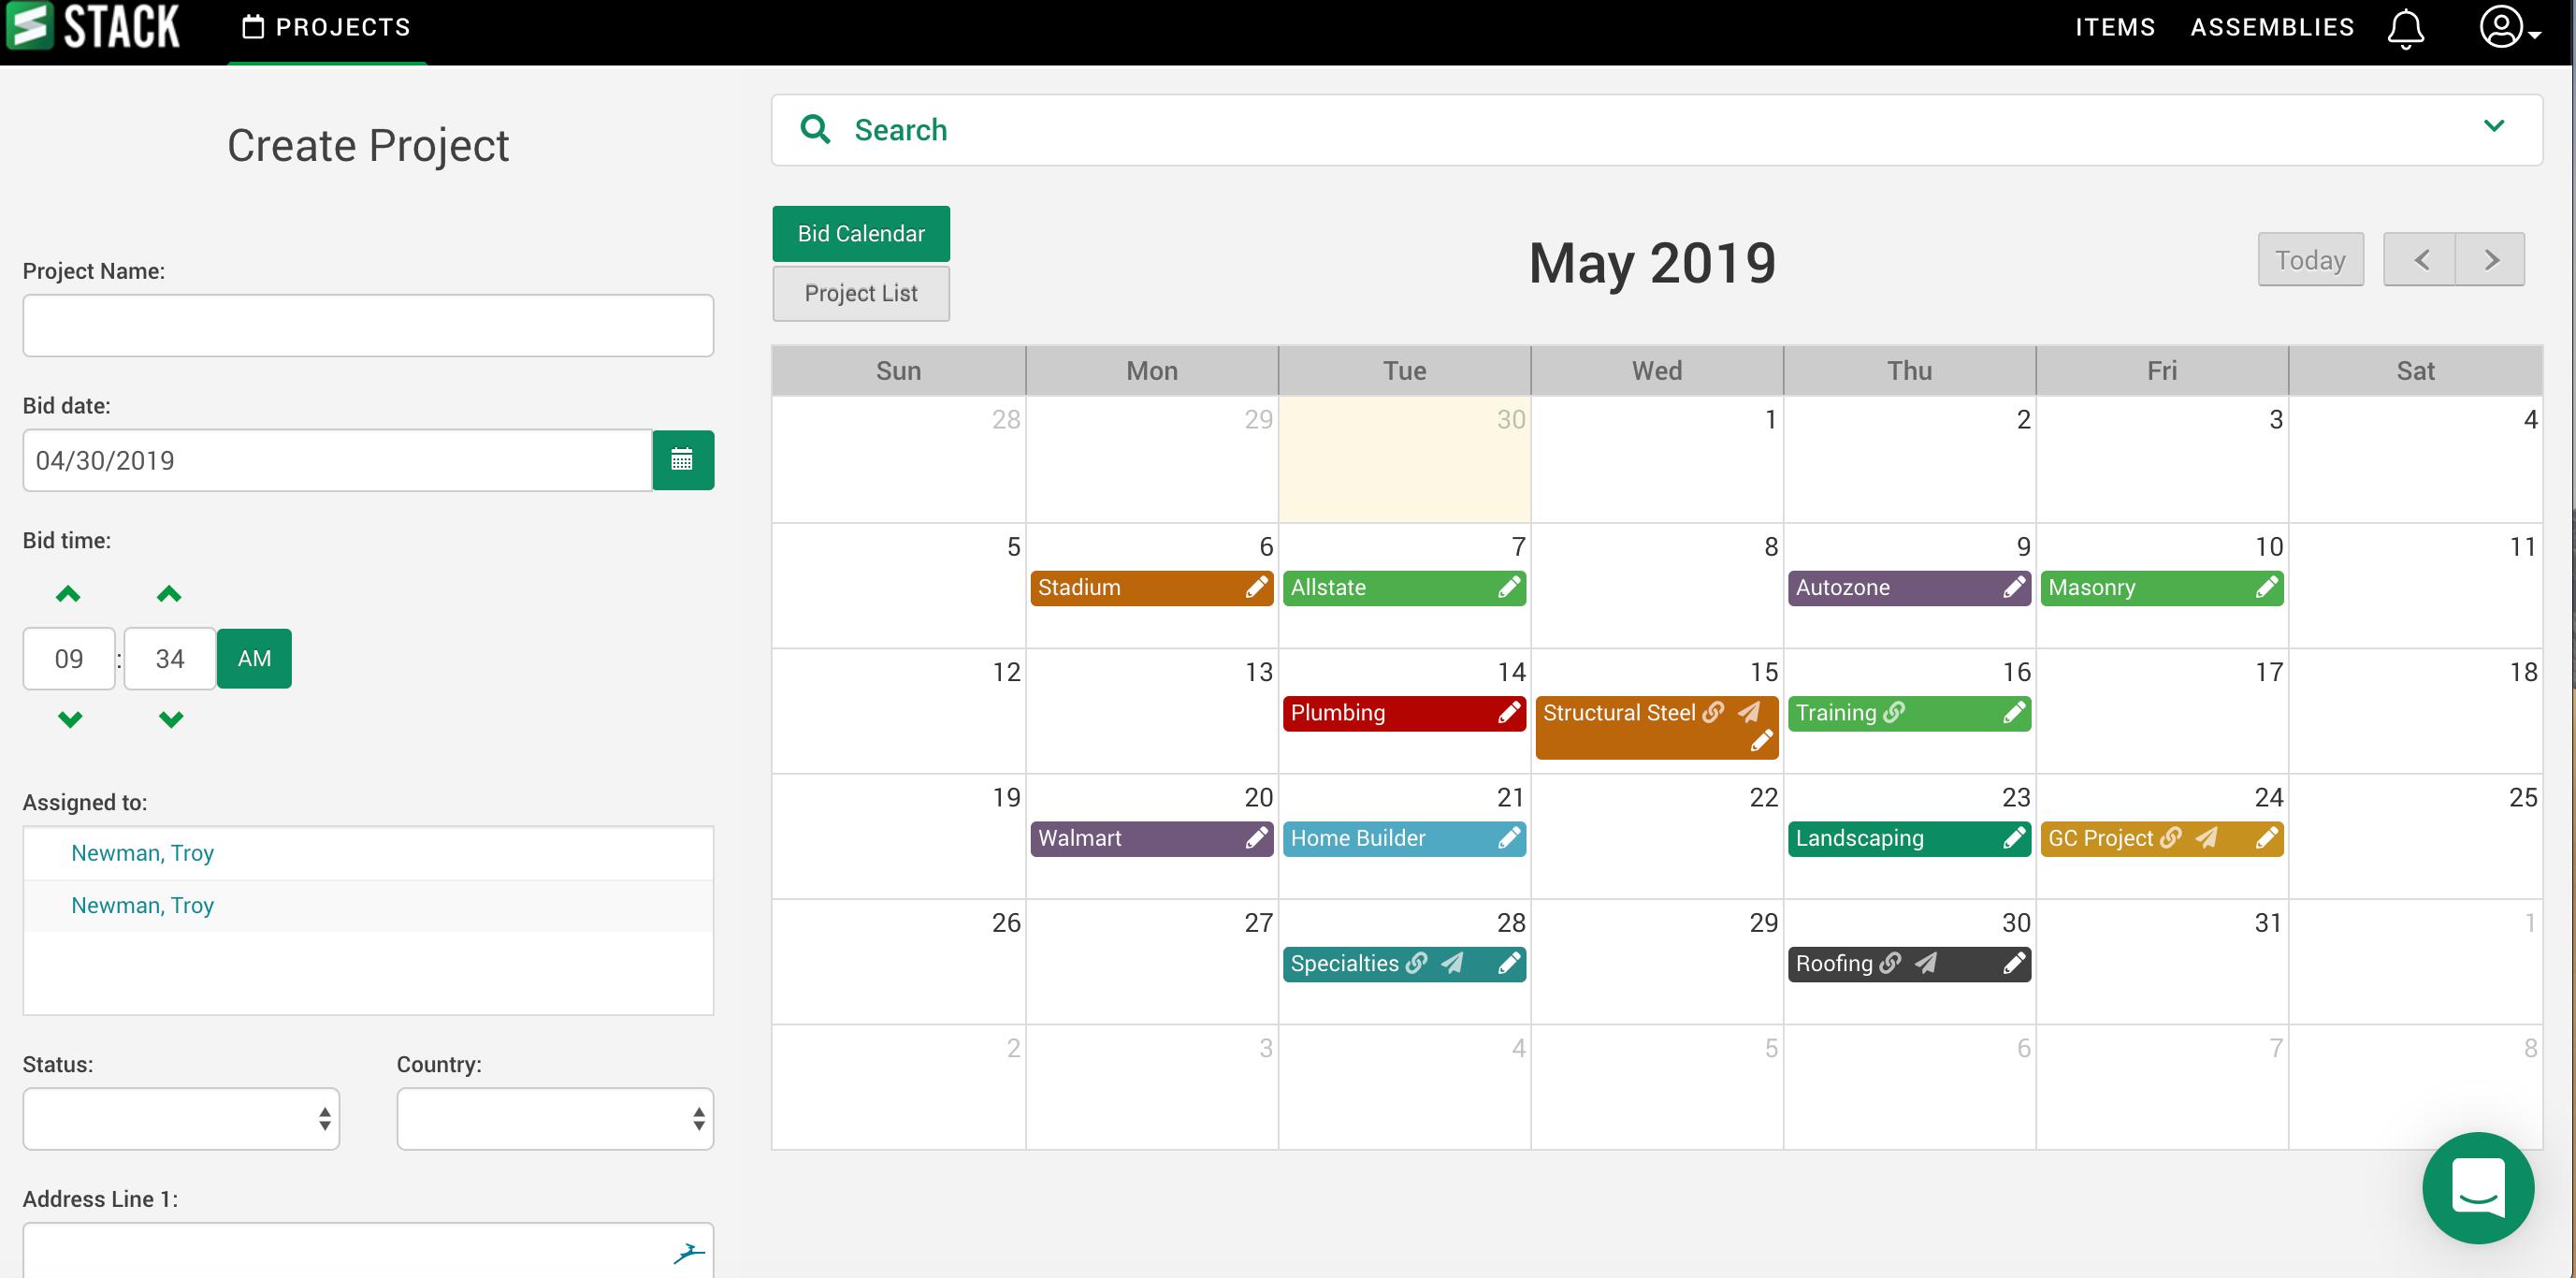 STACK Software - STACK bid calendar